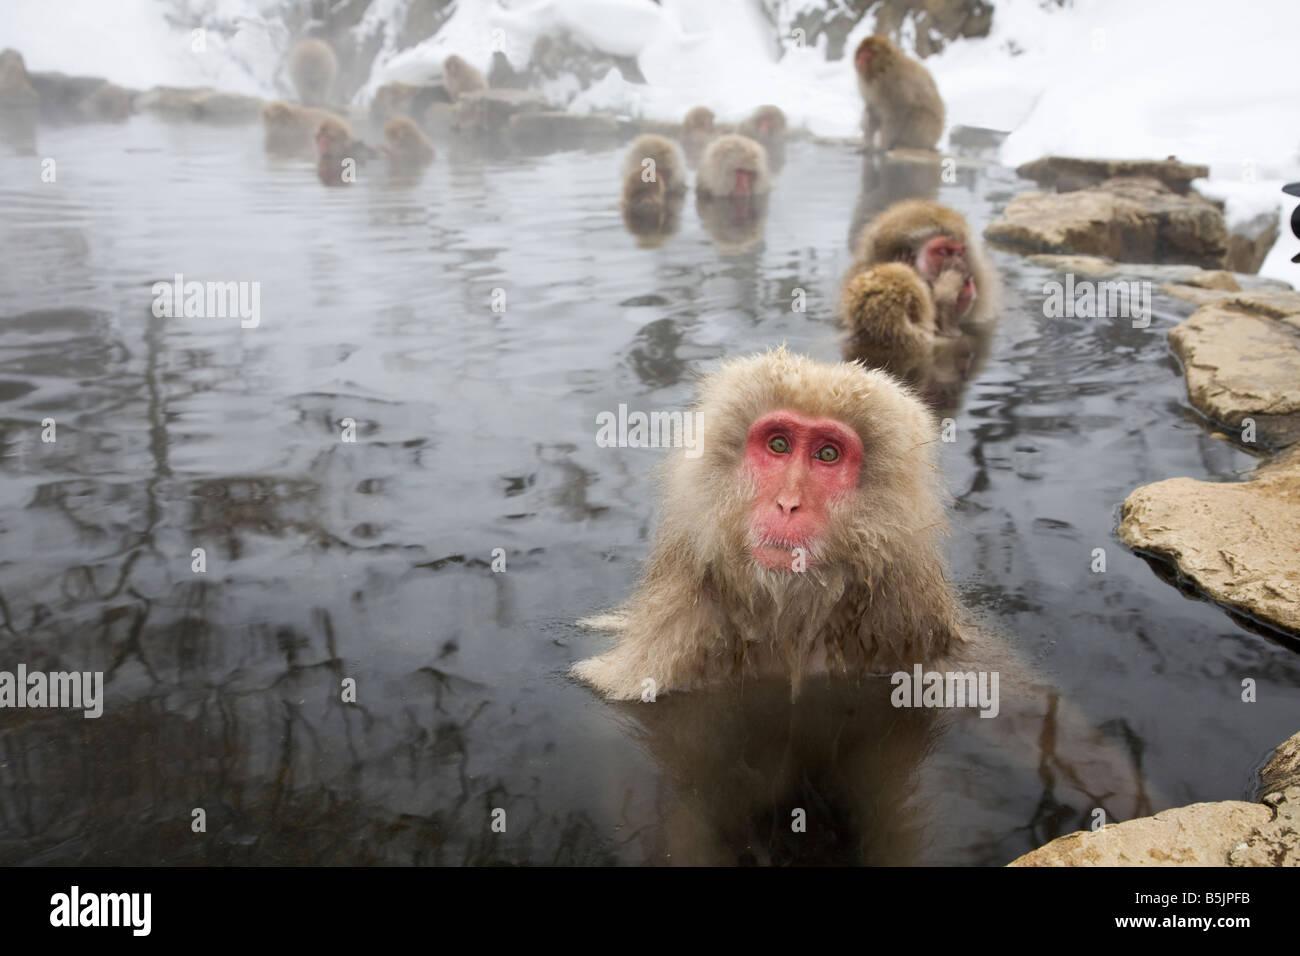 Jigokudani National Monkey Park, Nagano, Japan: Japanese Snow Monkeys (Macaca fuscata) in winter - Stock Image